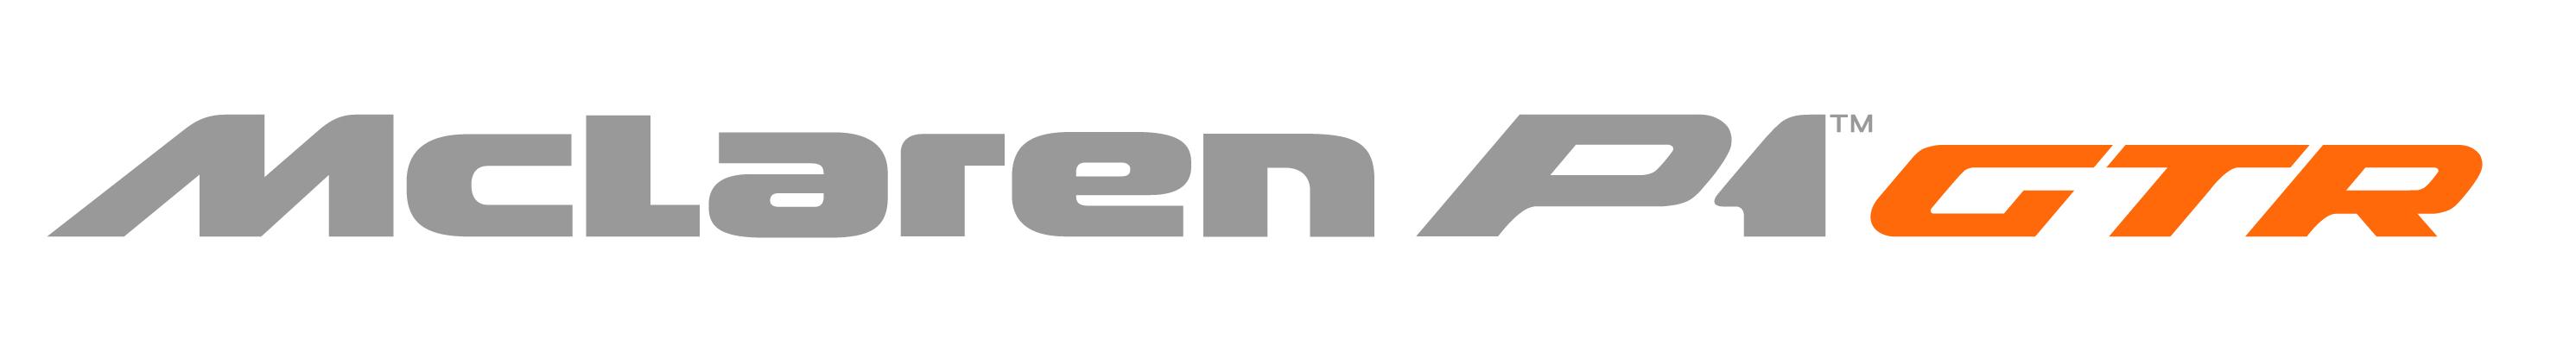 Filename: Mclaren-p1-gtr_logo.jpg - Mclaren Logo PNG